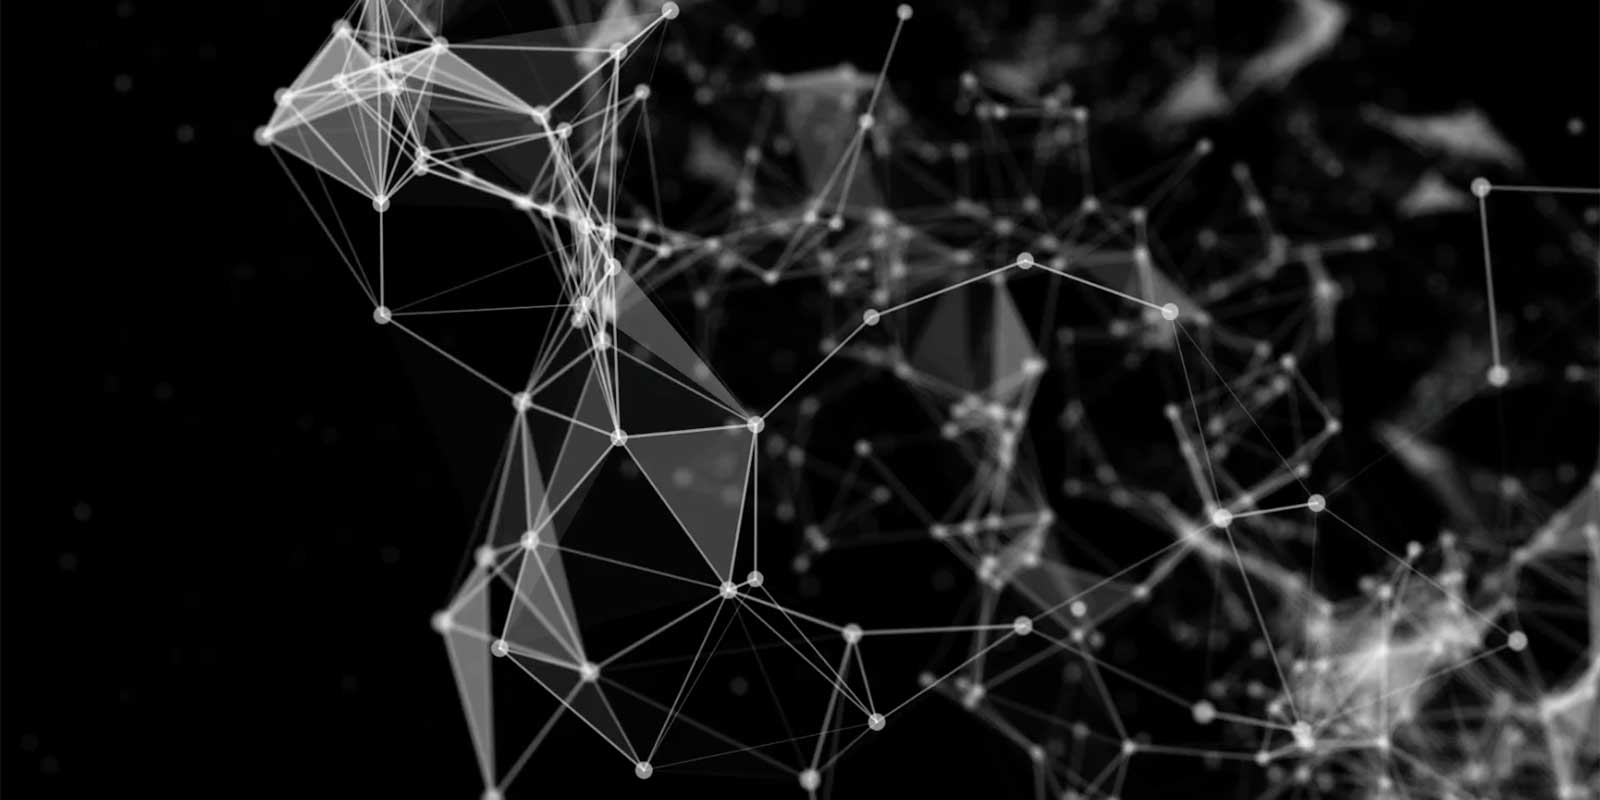 Netwerken: ondernemers helpen ondernemers